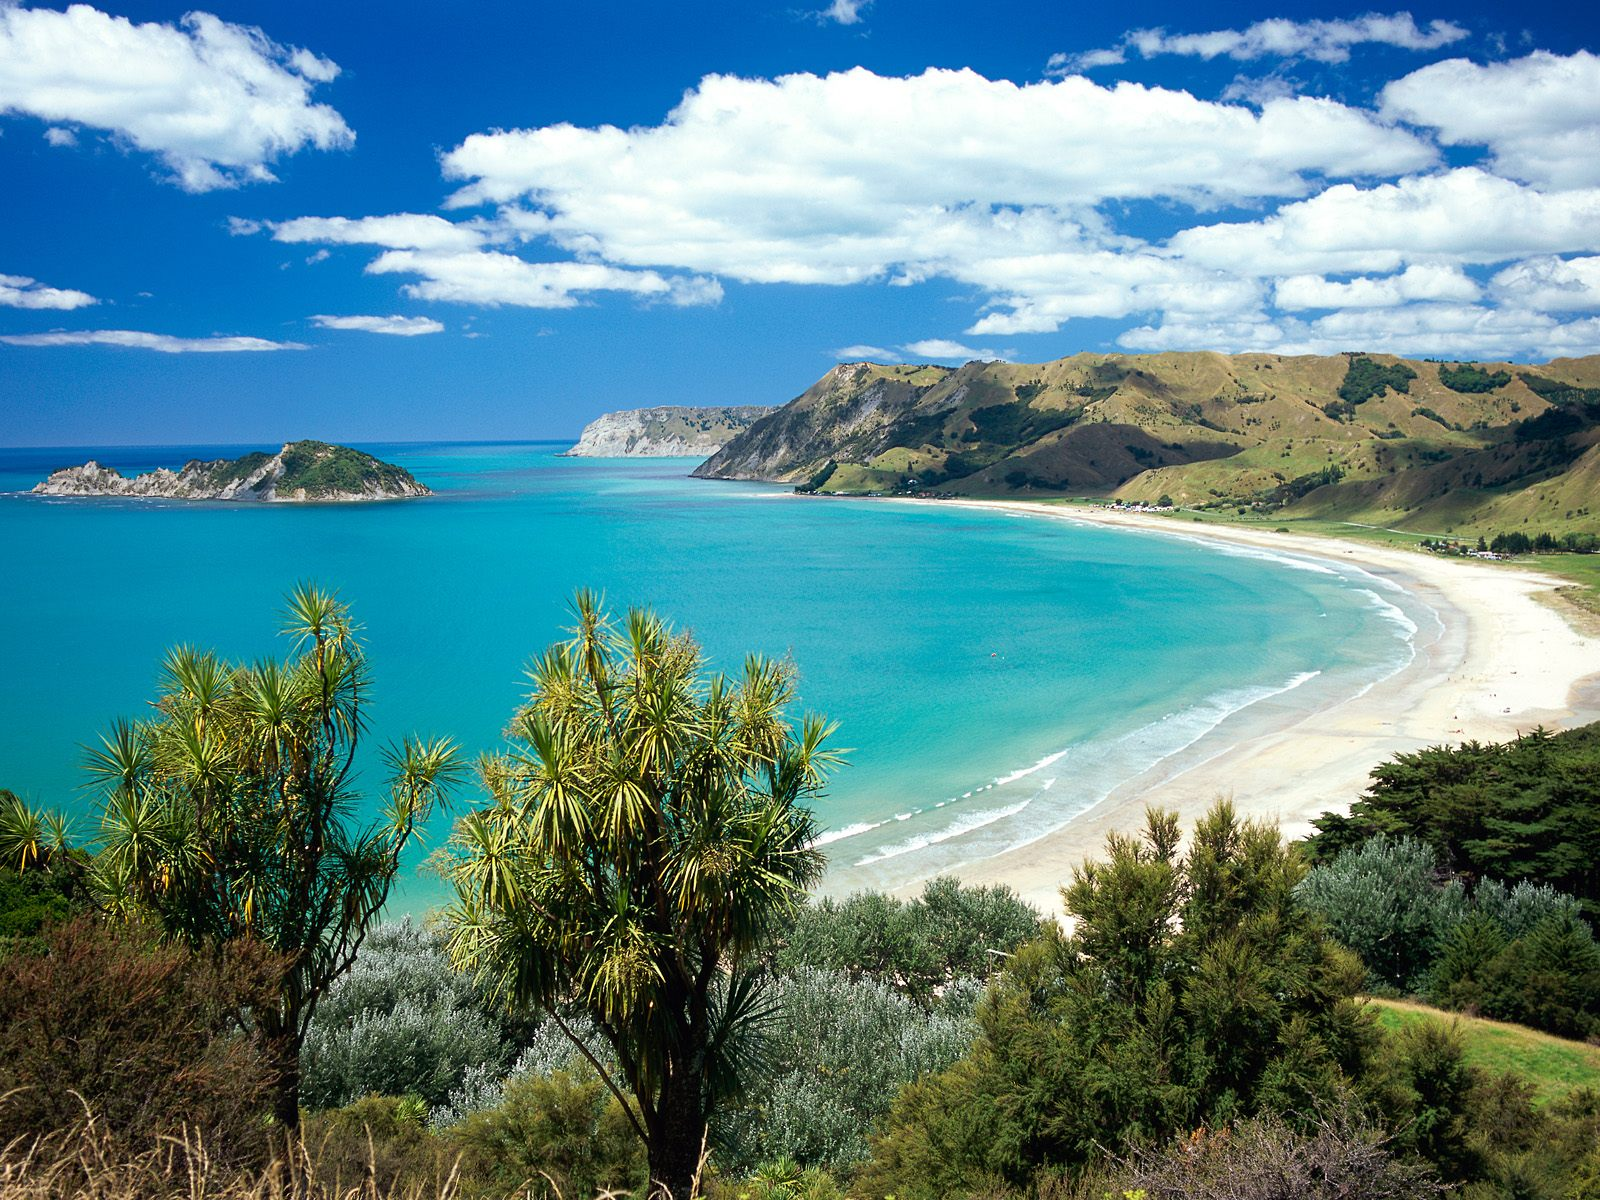 10. New Zealand